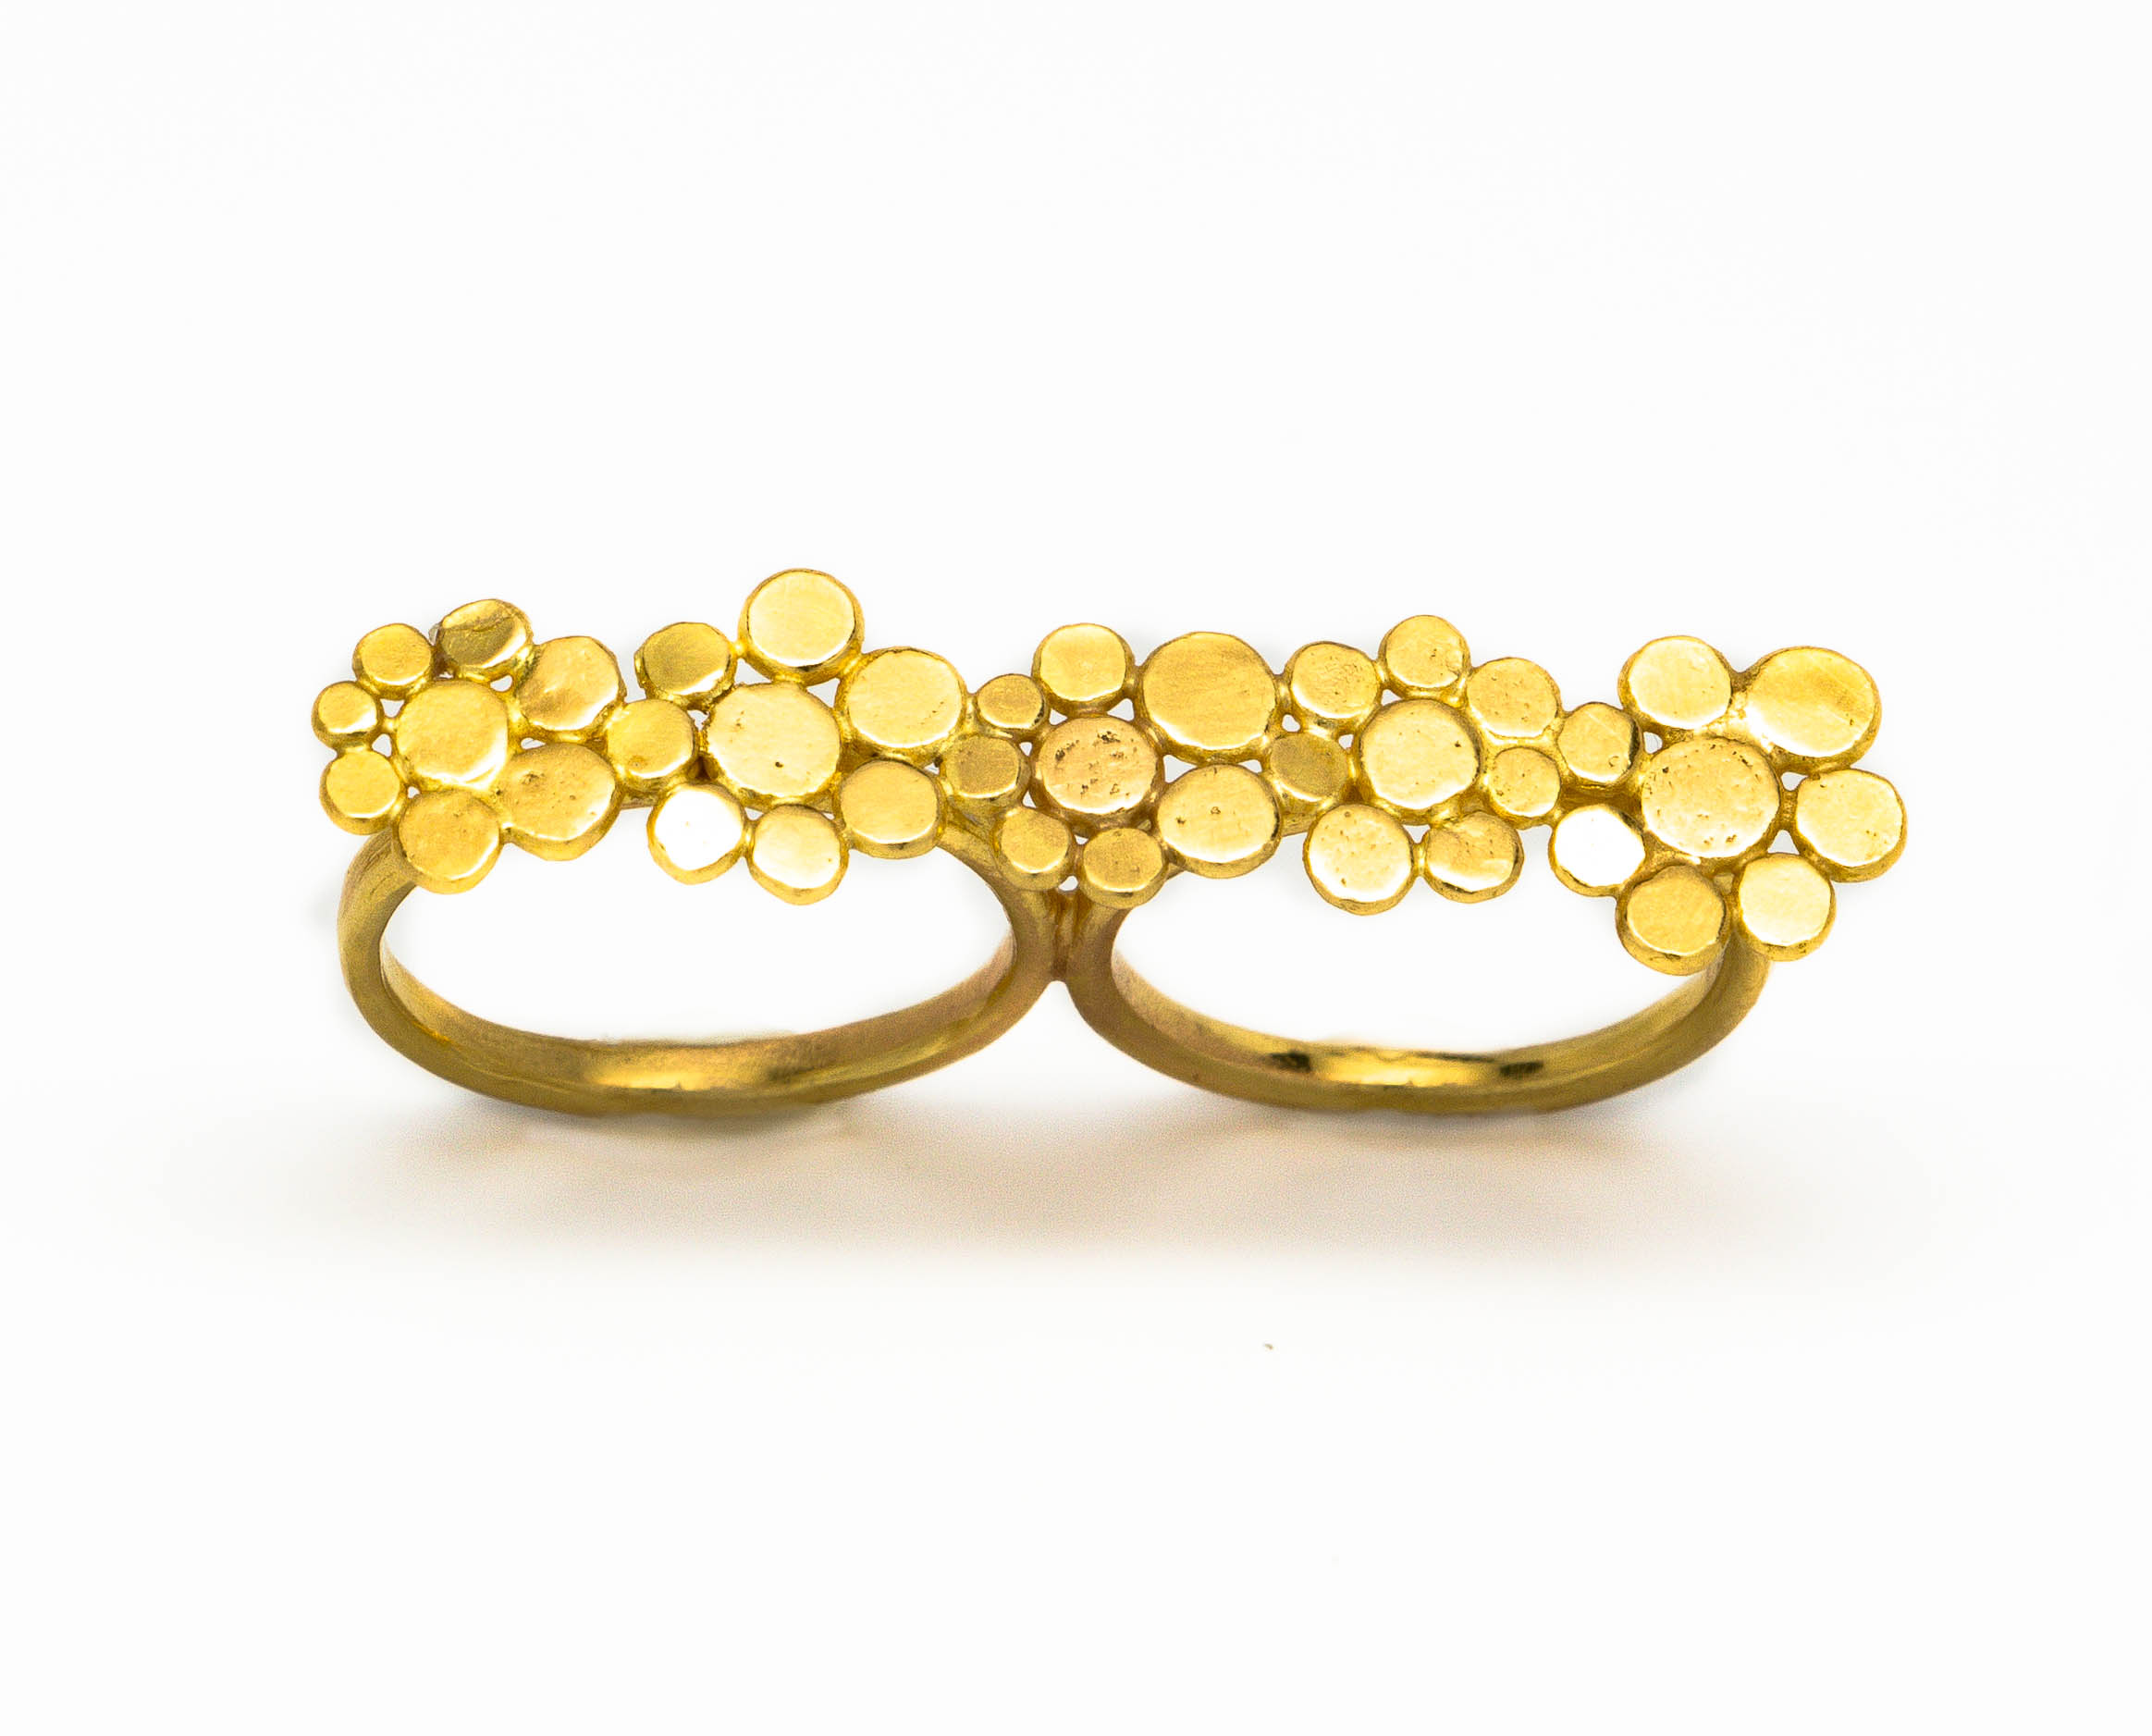 dec21 jewelry5-654.jpg